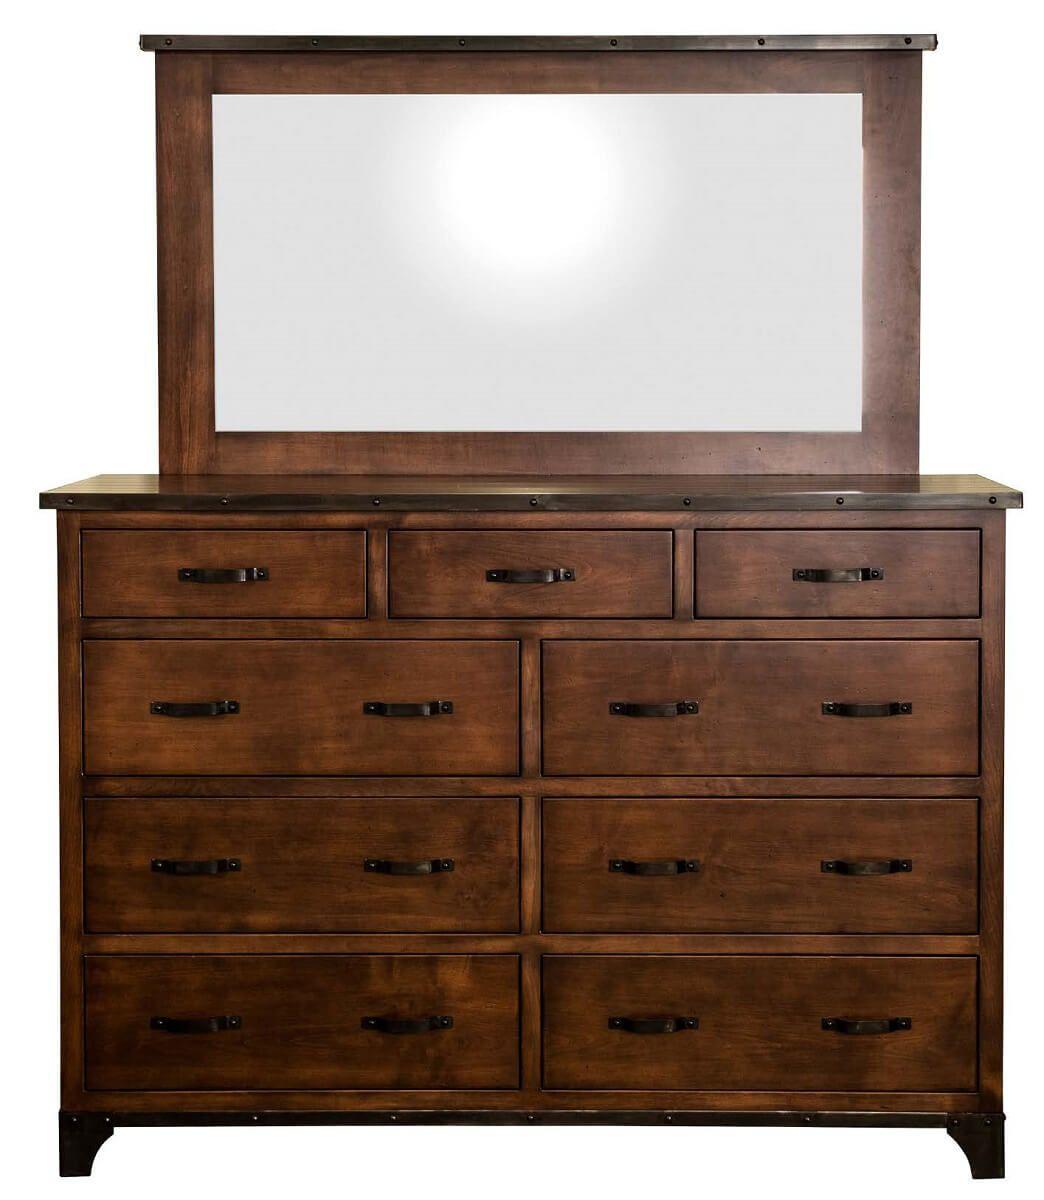 Etonnant Murfreesboro Wooden Dresser